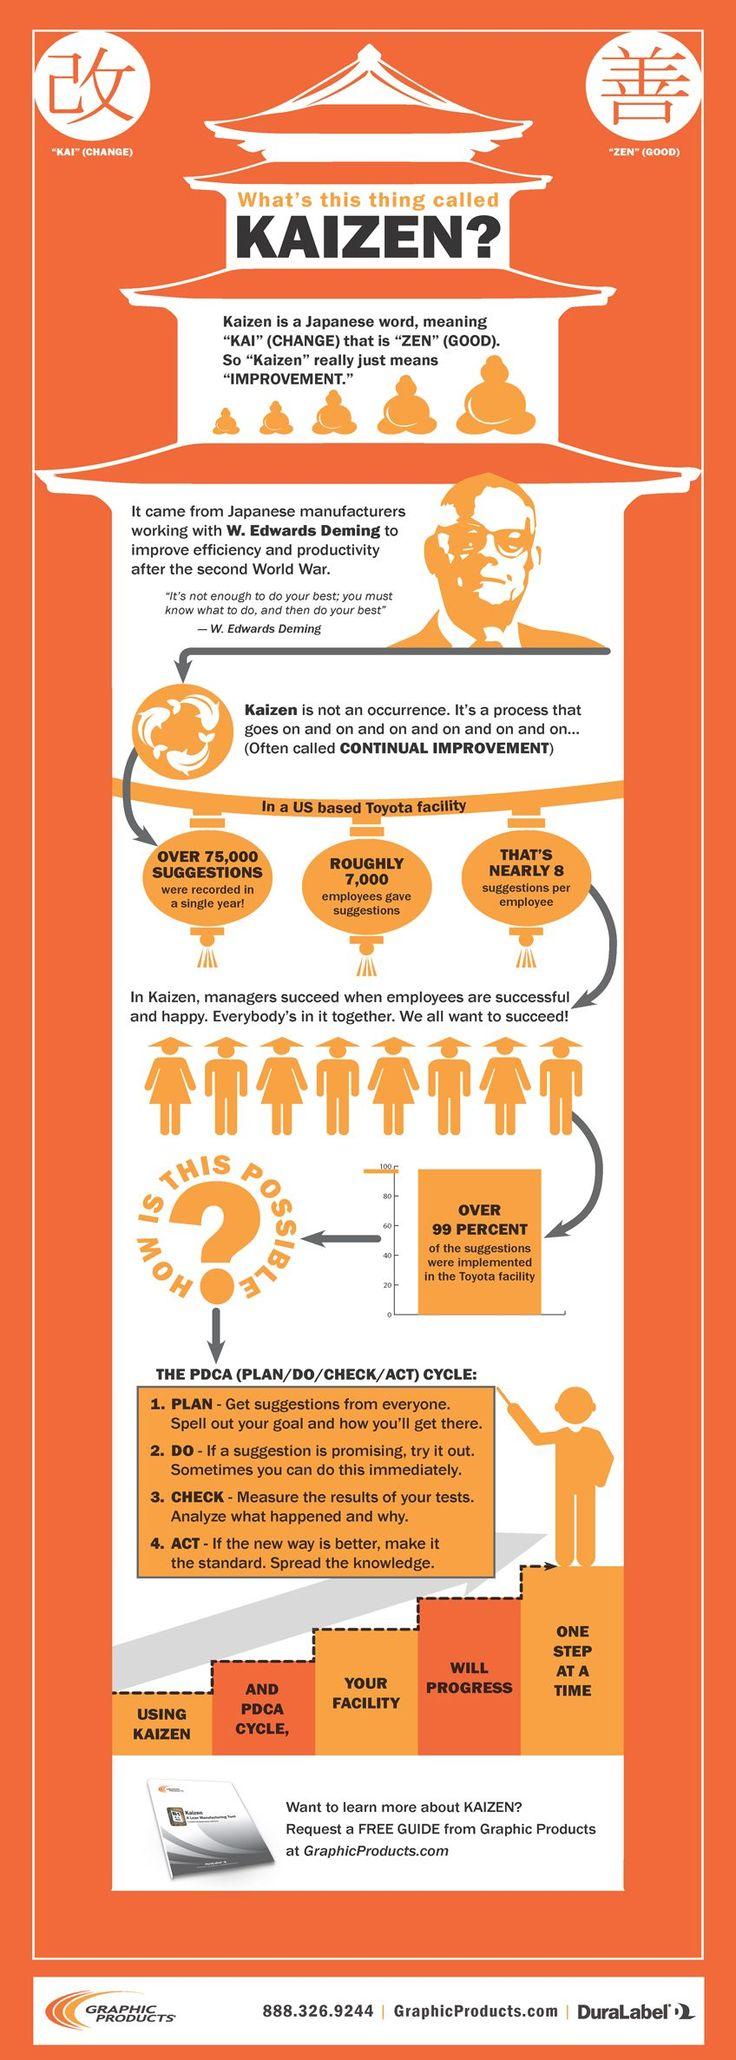 Kaizen - A Lean Tool ¿Quieres certificarte en PNL? - Niveles Practitioner, Master Practitioner y Trainer por la AUNLP (R) - American Union of NLP - estudiando a tu propio ritmo - Online y en Español - Todos los detalles aquí --> WWW.UAPNL.COM | #pnl #programacionneurolinguistica #coaching #desarrollopersonal #tecnicasdepnl #ejerciciosdepnl #coachingconpnl #tecnicaspnl #ejerciciospnl #coachingpnl #inteligenciaemocional #psicologia #psicologiapositiva #crecimientopersonal